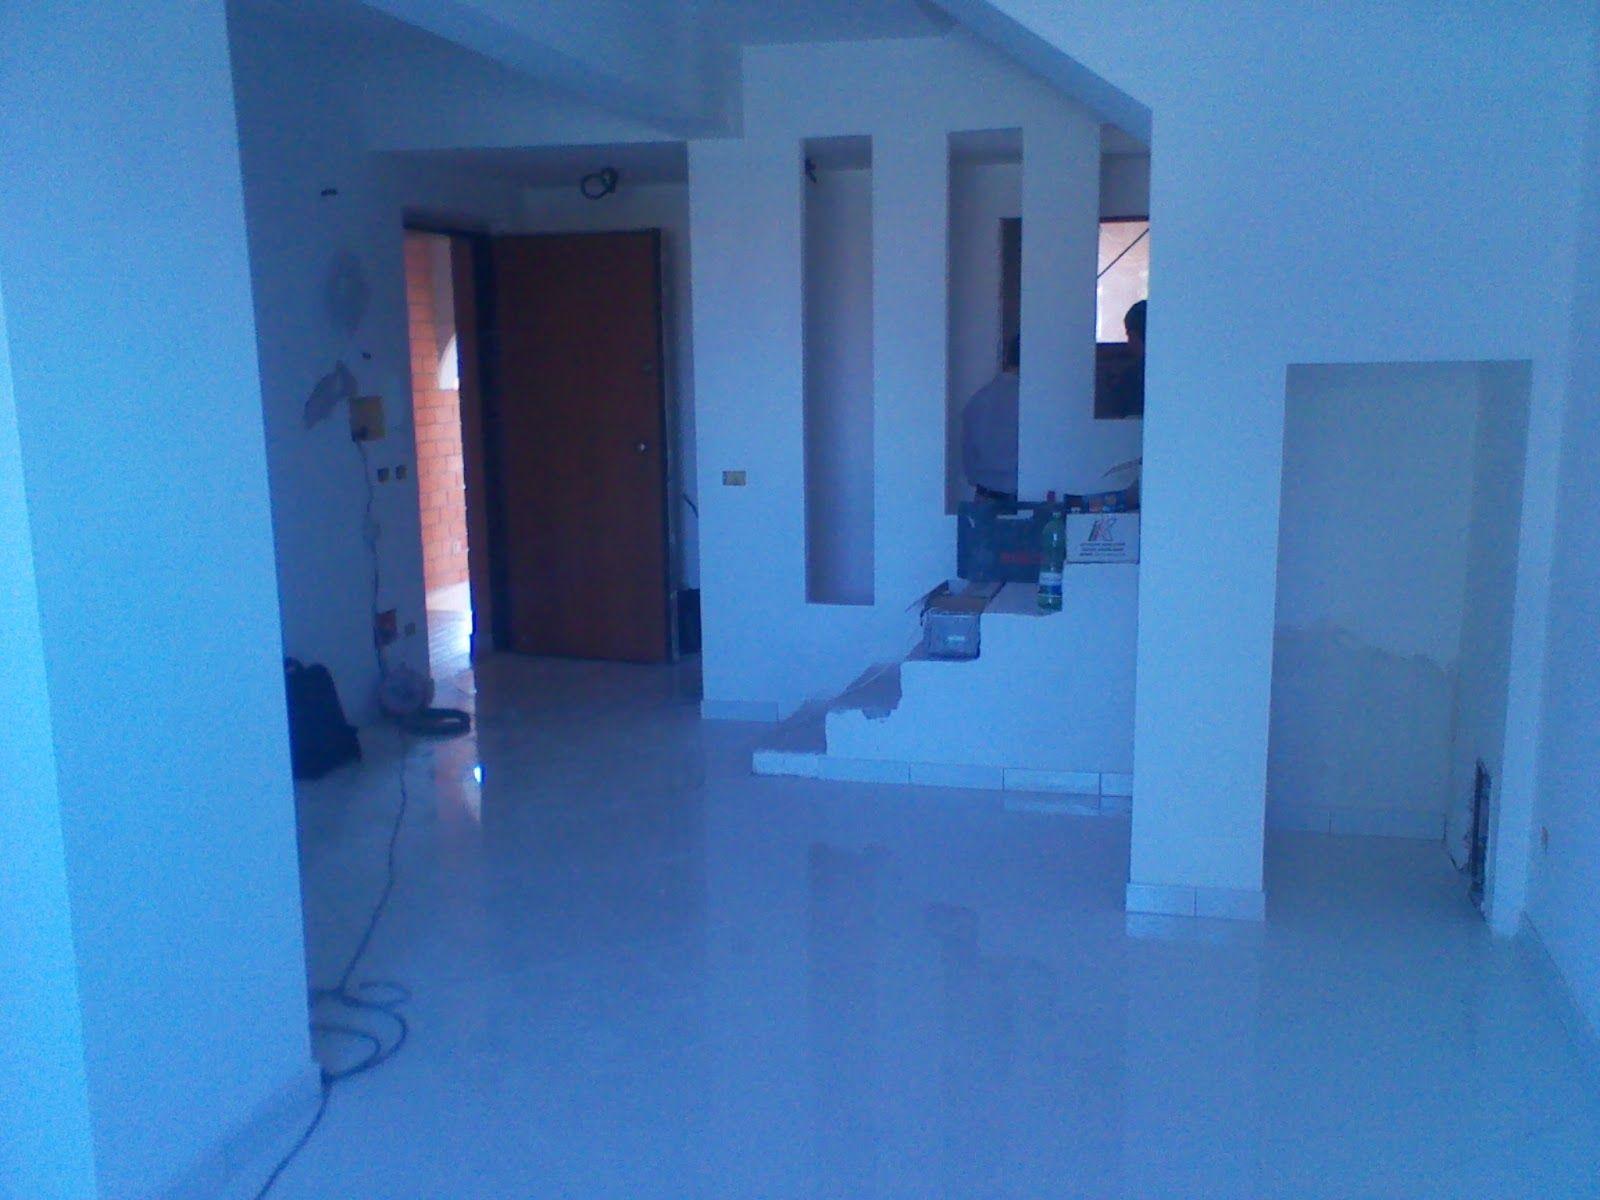 Pavimento Gres Porcellanato Bianco Lucido.Salone Vista Ingresso Pavimento Gres Porcellanato Bianco